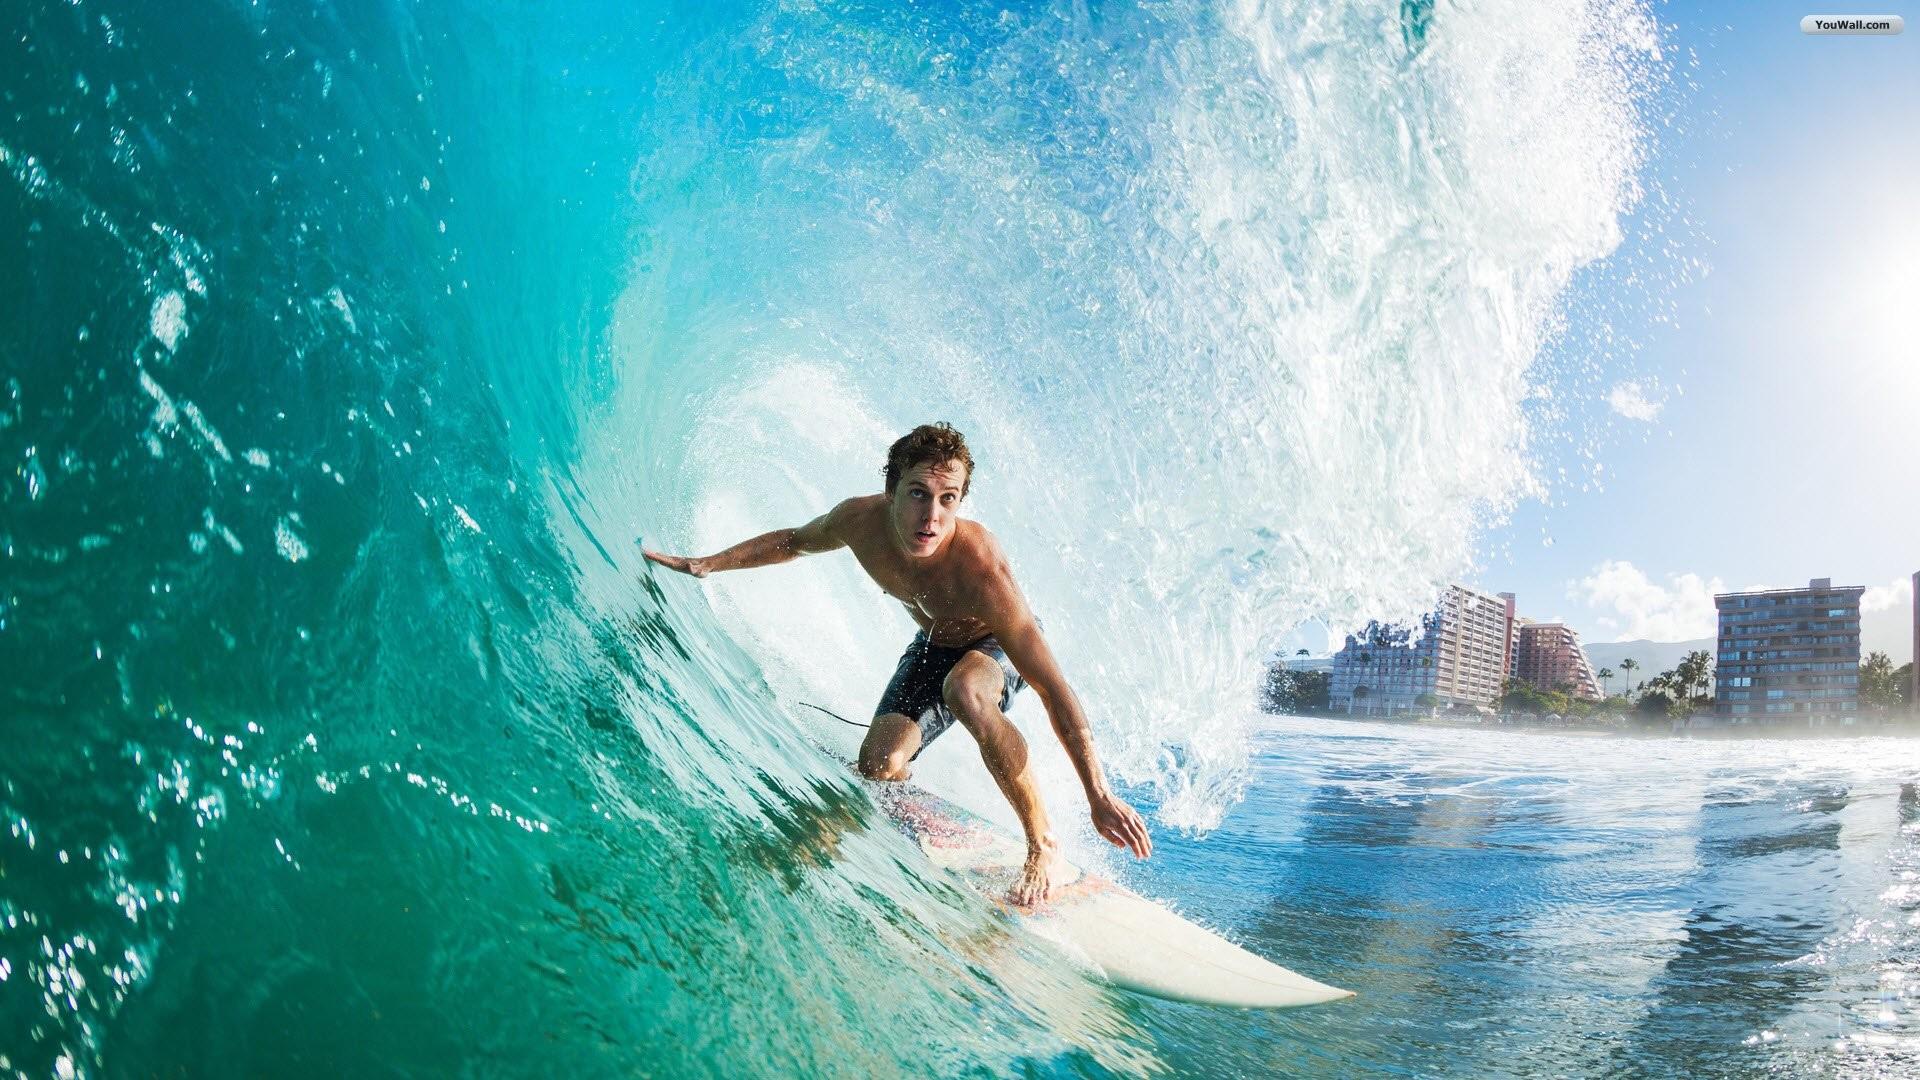 HD Surfing Surf Wave Wallpaper 1080p – HiReWallpapers 7595